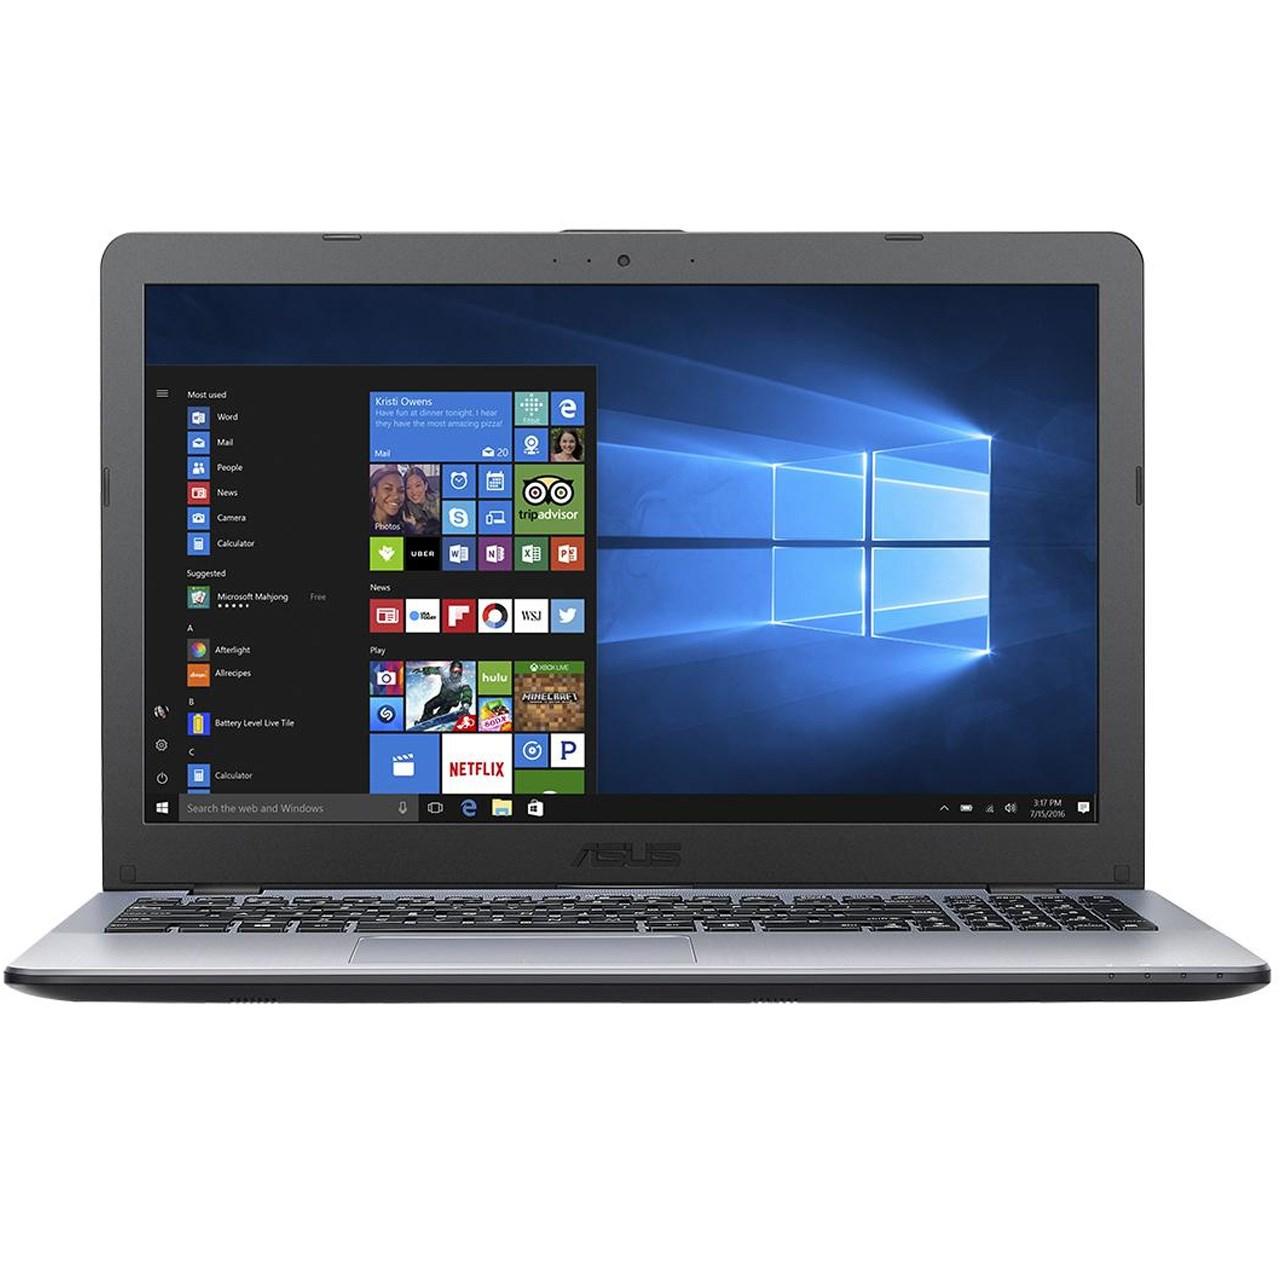 لپ تاپ 15 اینچی ایسوس مدل VivoBook R542UR - E